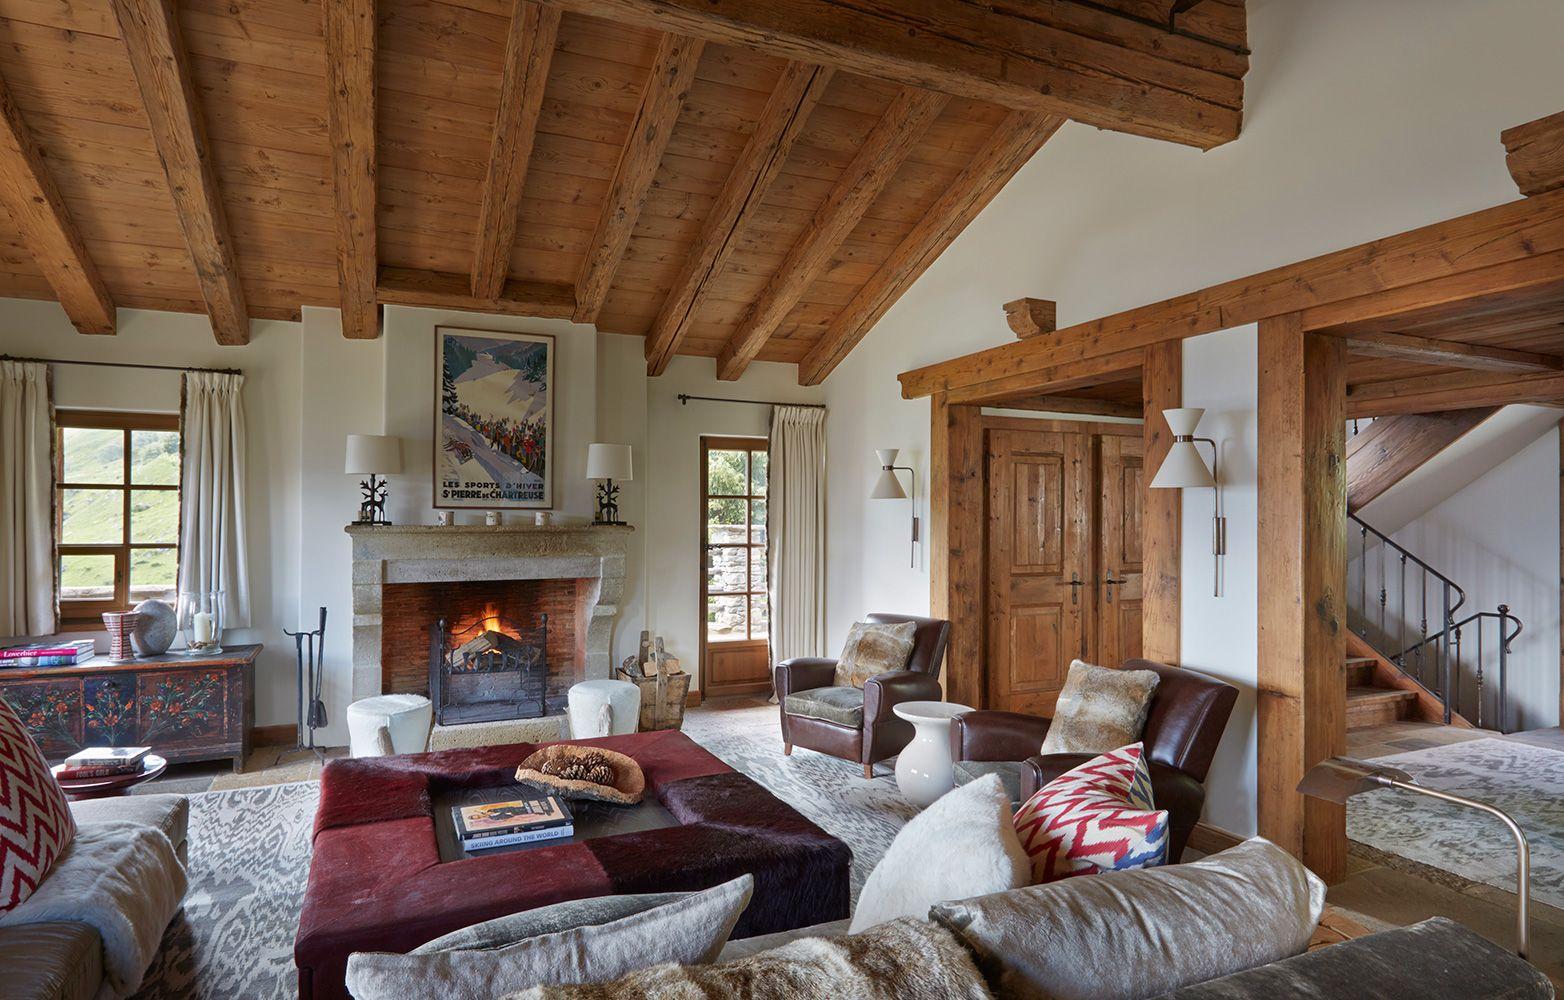 INTERIOR DESIGN  CHALETS  Swiss Chalet Todhunter - Swiss home design